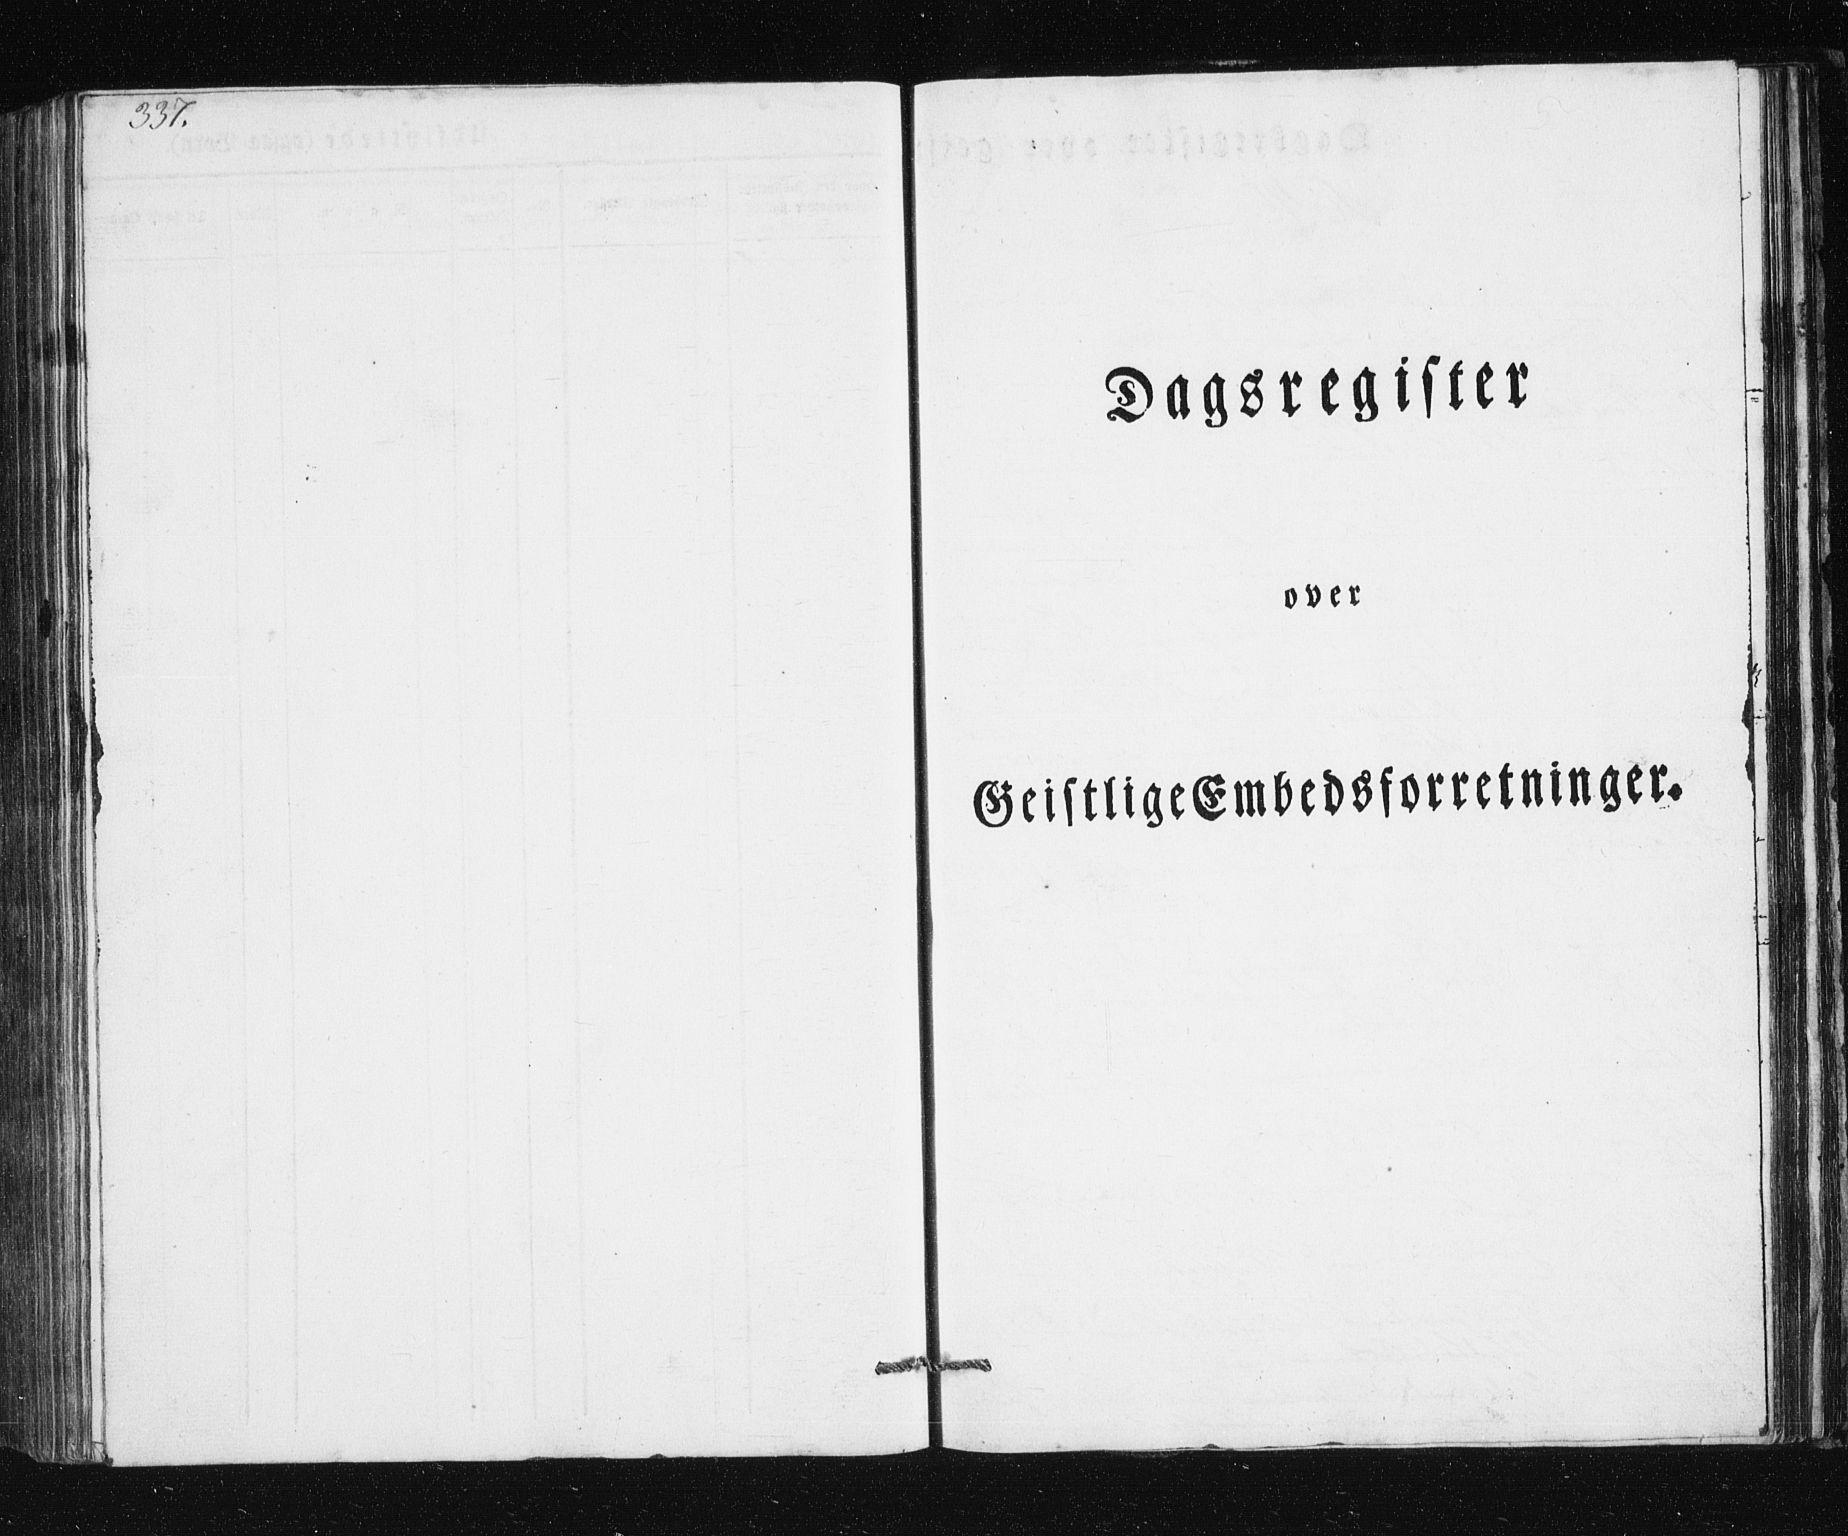 SATØ, Mefjord/Berg sokneprestkontor, G/Ga/Gab/L0011klokker: Klokkerbok nr. 11, 1833-1878, s. 337